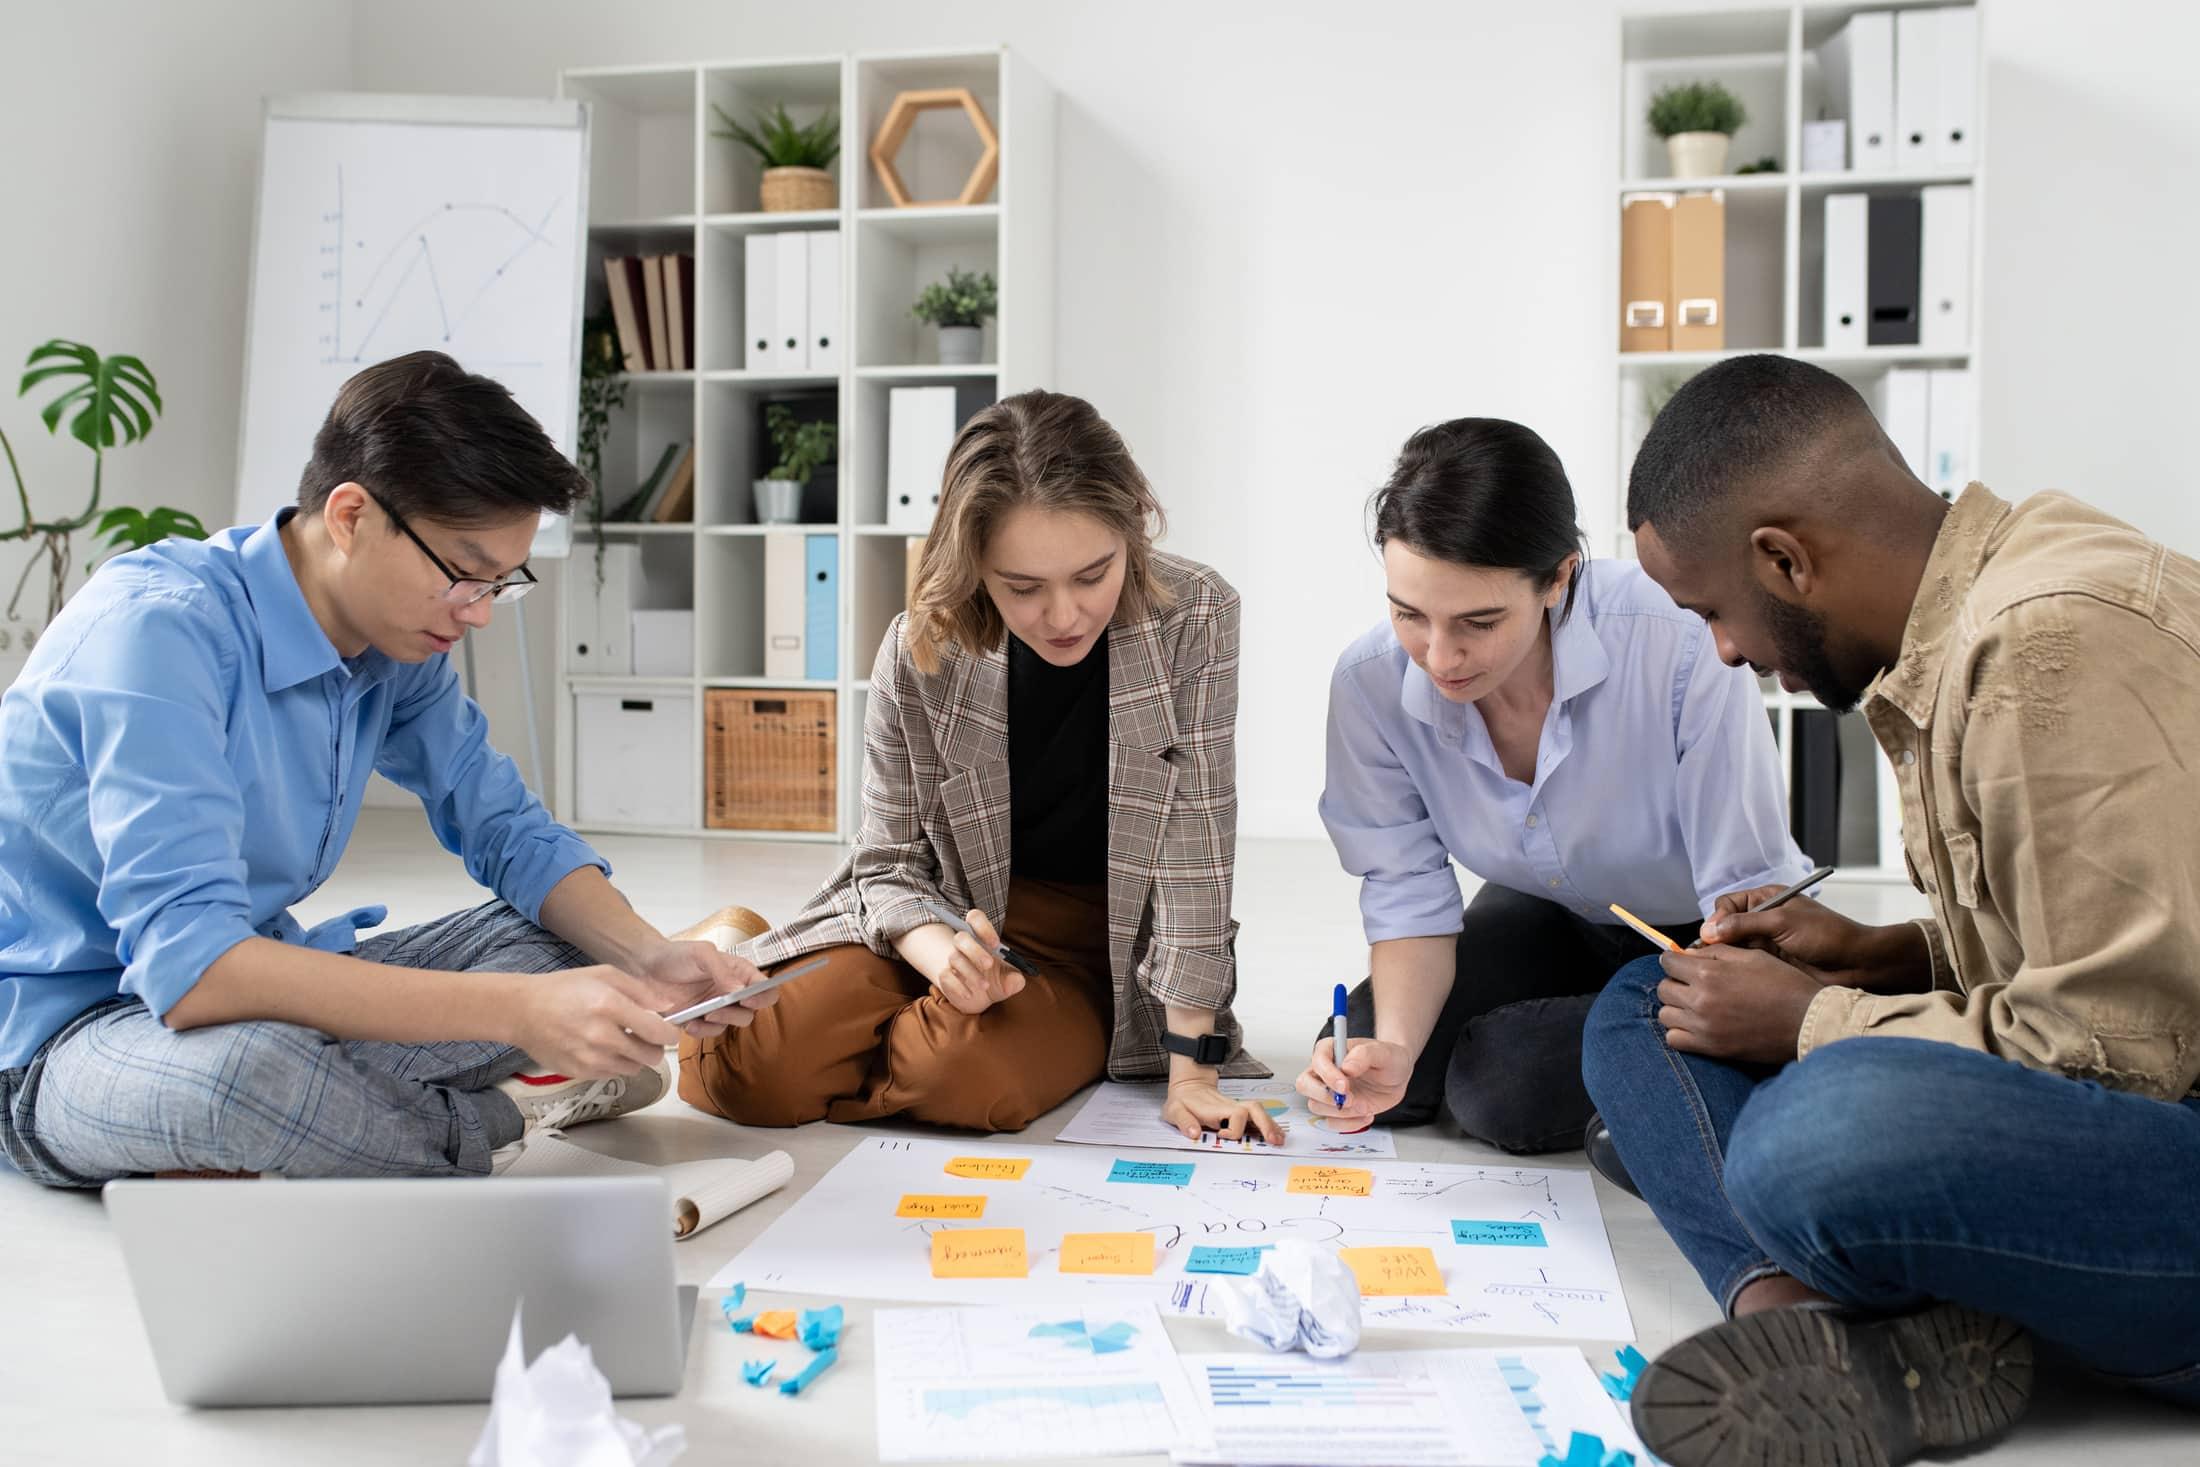 startuppers analyzing marketing strategies 9TFA6AG